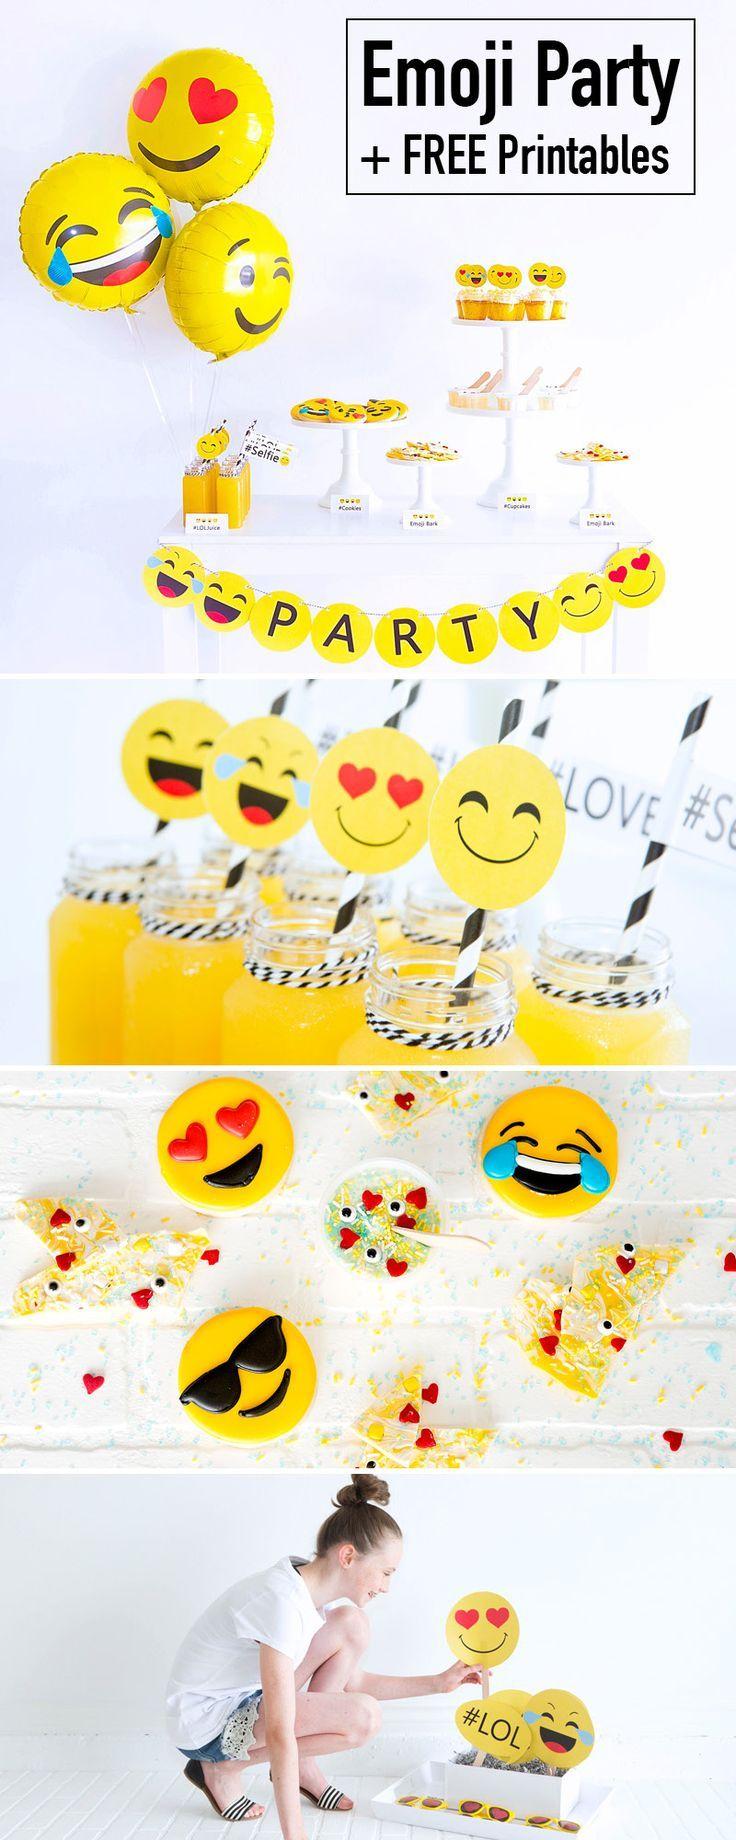 Birthday invitations free printable yelomphonecompany birthday invitations free printable stopboris Gallery